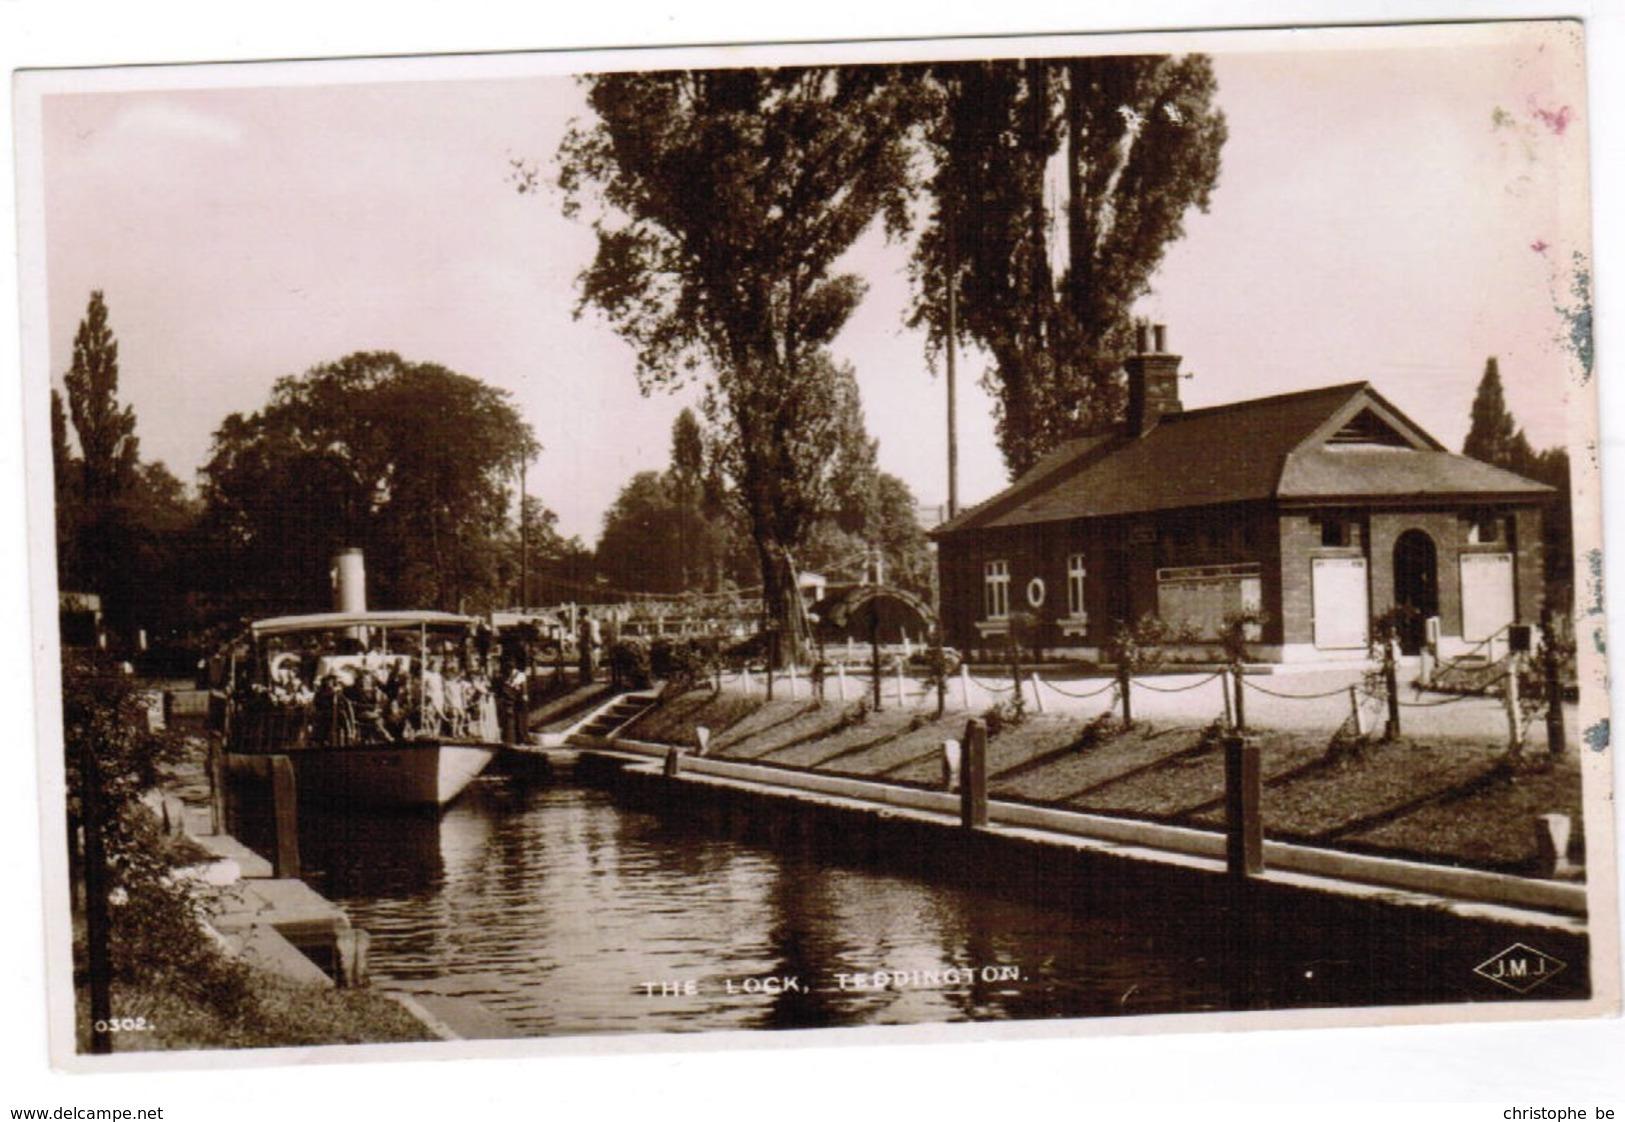 Old Postcard, The Lock Teddington (pk32746) - London Suburbs